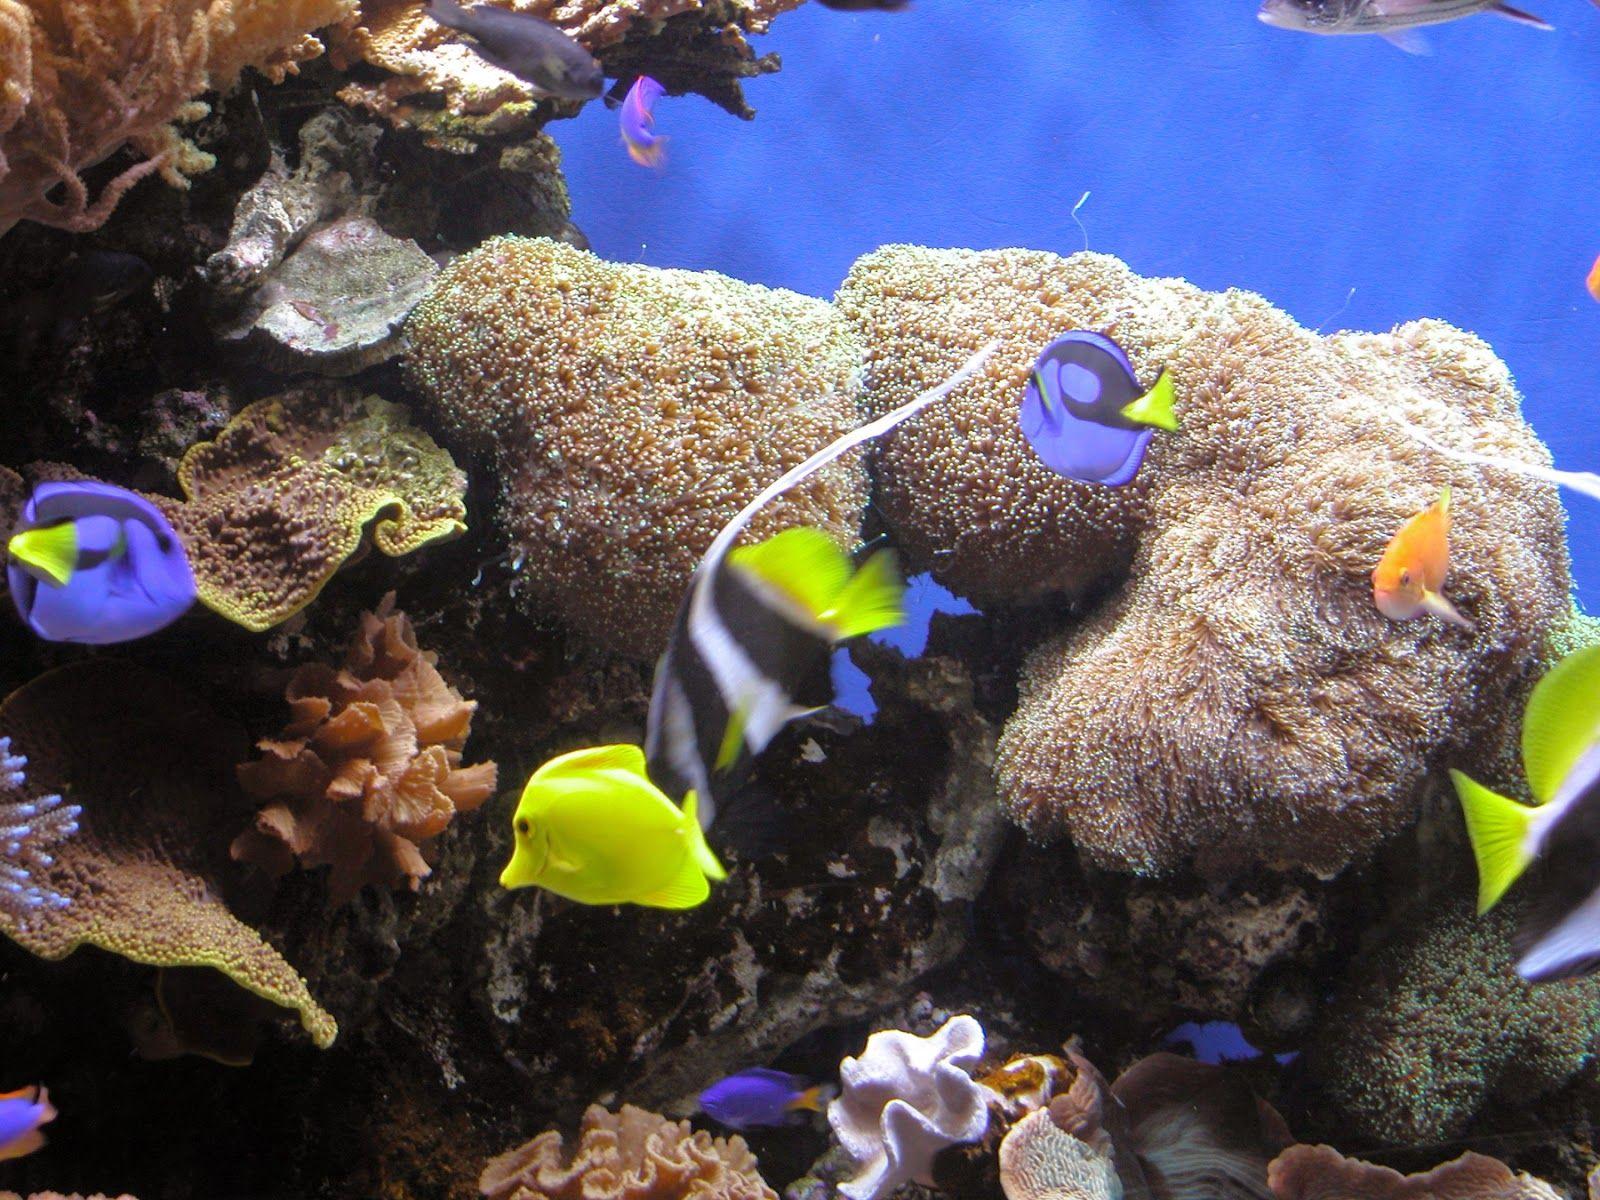 Best Images Of Under Water World Saltwater Aquarium Fish Tropical Fish Marine Fish Tanks